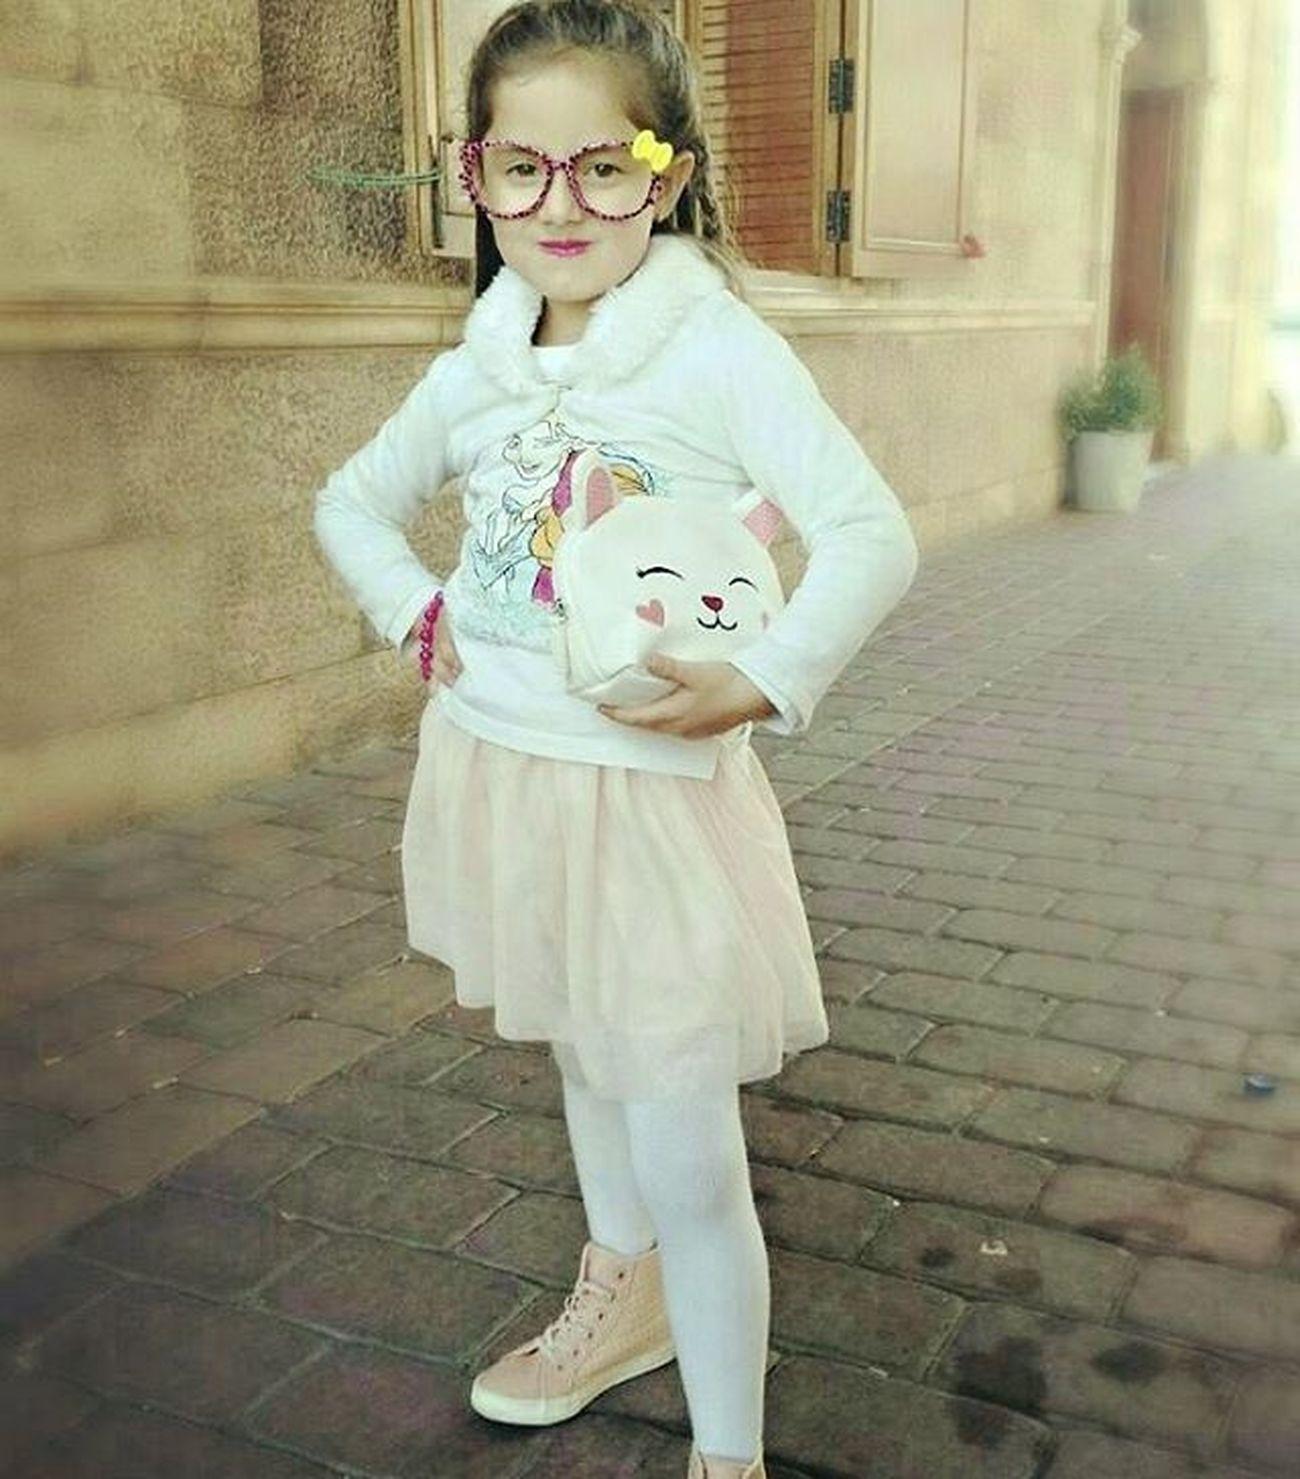 I love mi shoes!!! 💙👡💜 Hello Baby Love Rabbit Rabbits Rabbitstagram Pink Pinkbeba Cute Socute Beautifle Girl Beautifulgirl Cutegirl Kid Fashionkids Cutekid Lookday Lookoftheday Style Stylekid Stylegirl Hair Hairstyle White glasses fashionglasses likeme followme skirt